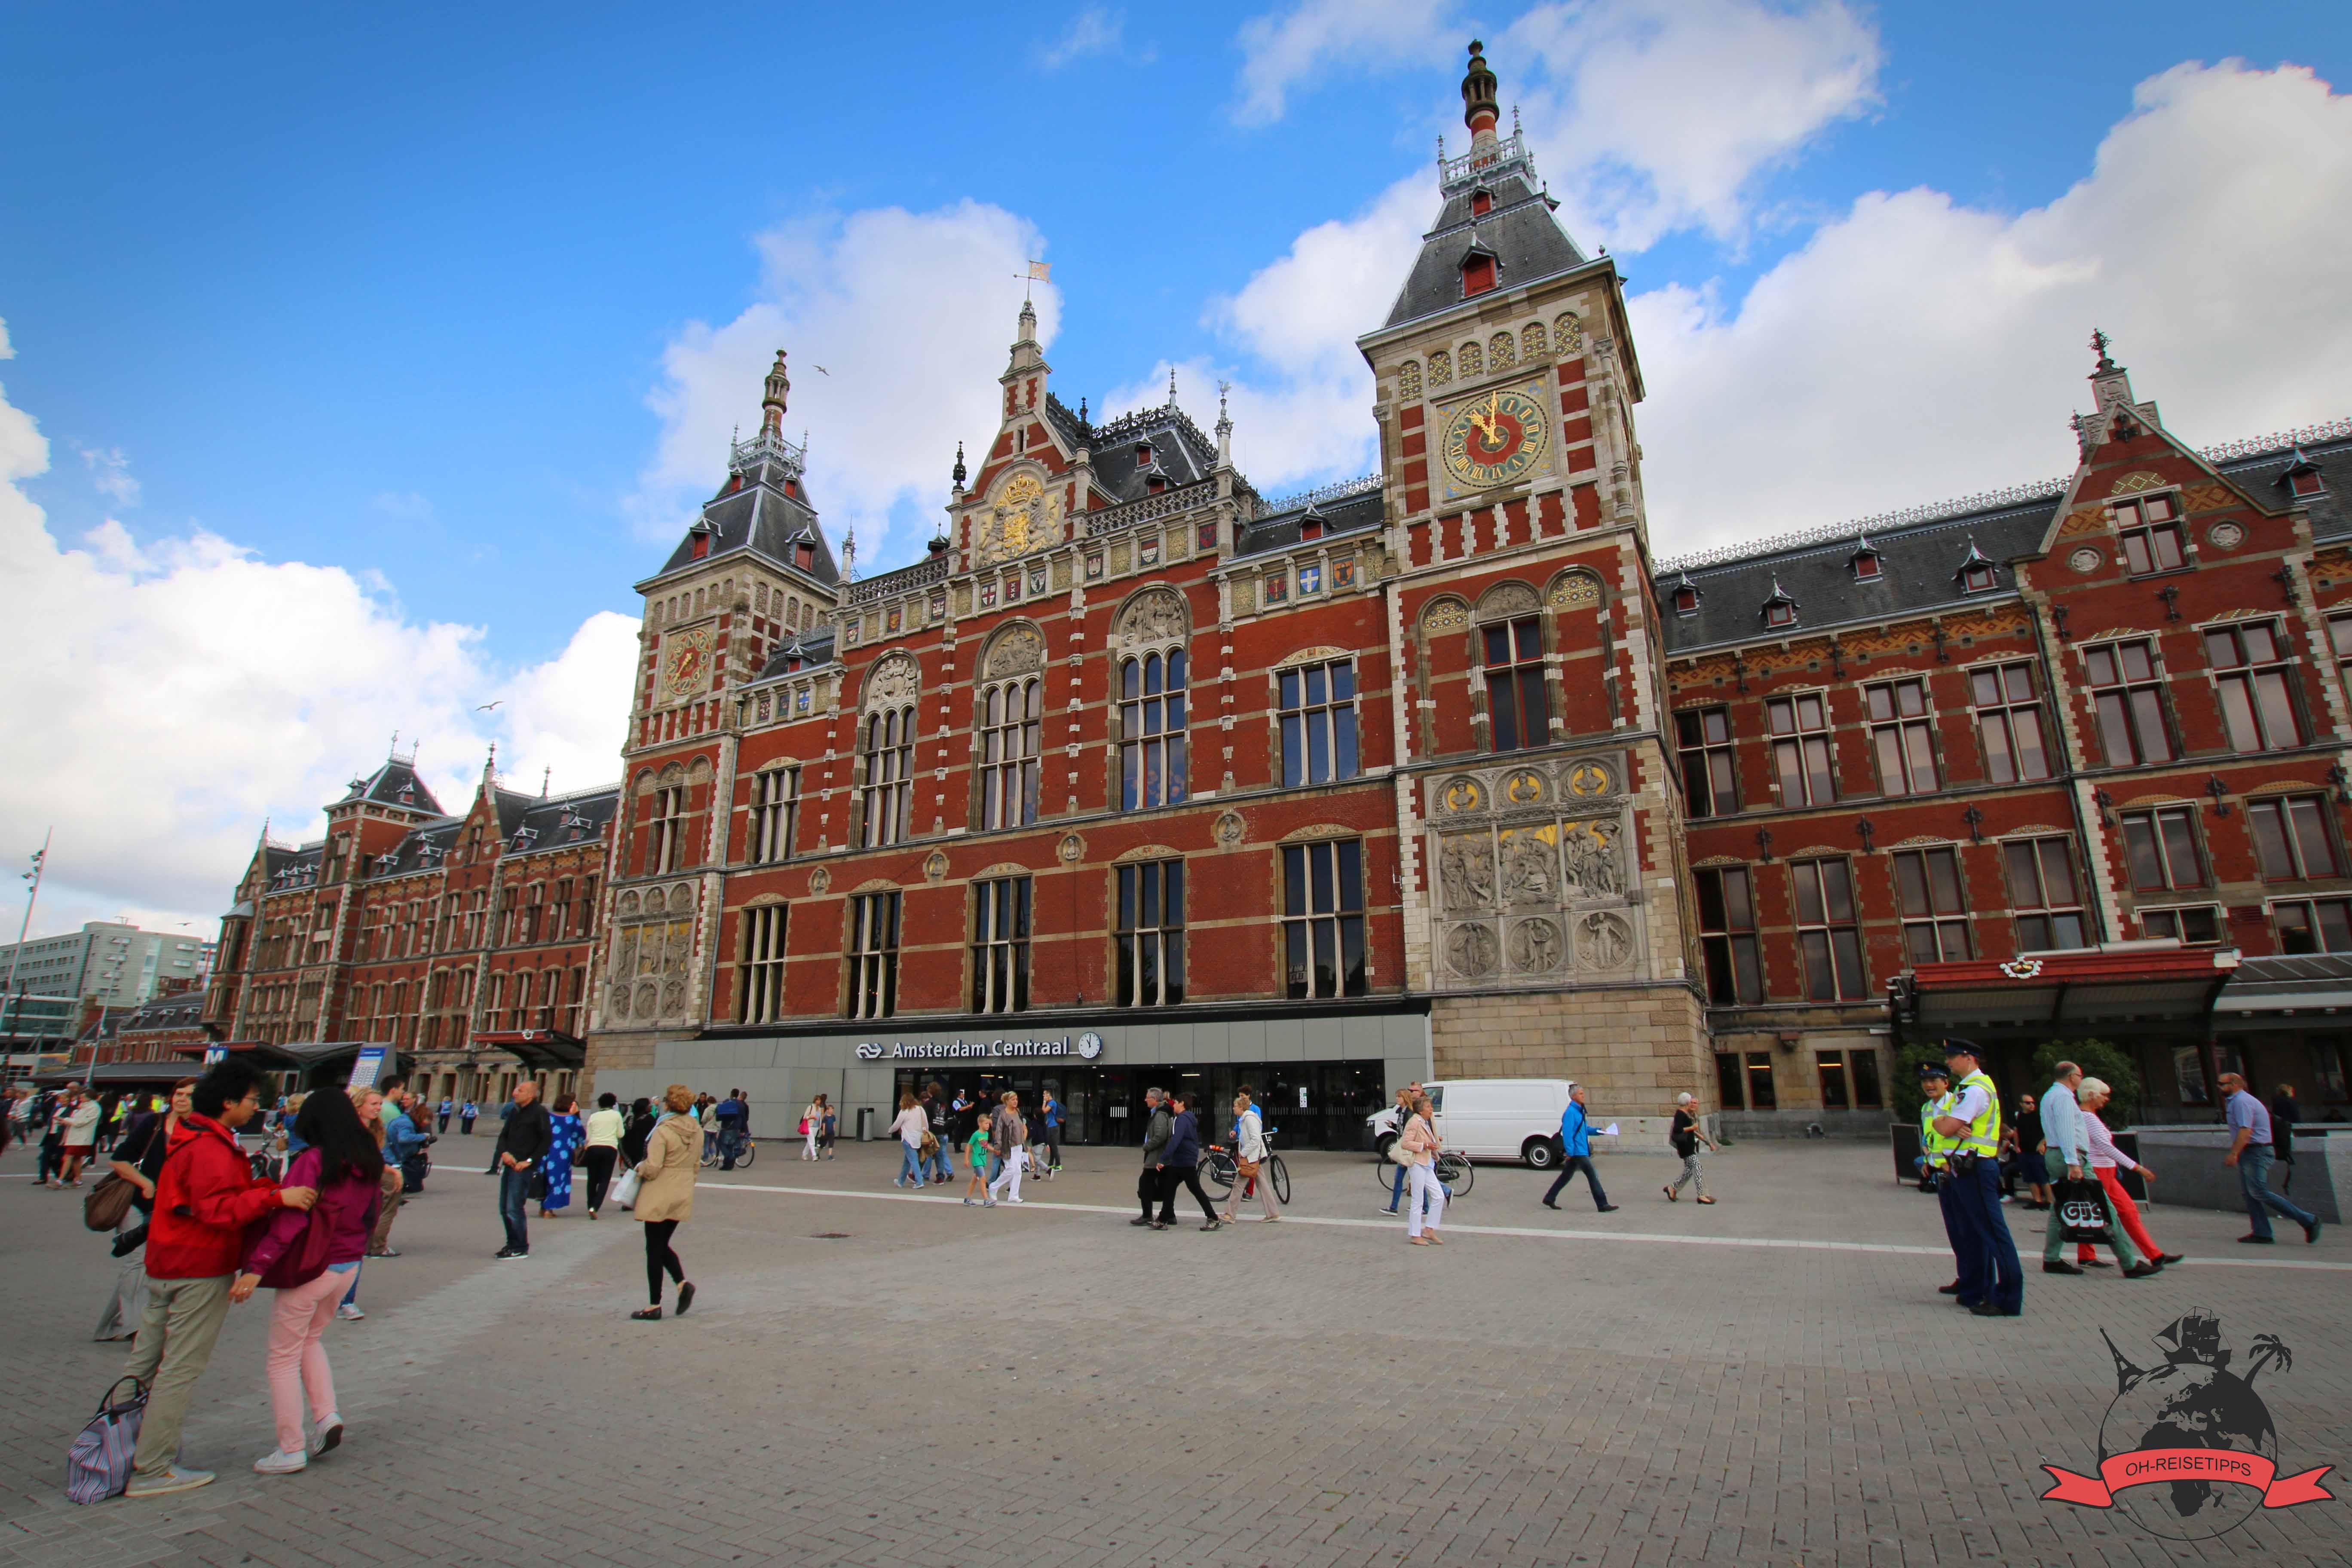 niederlande-amsterdam-centraal